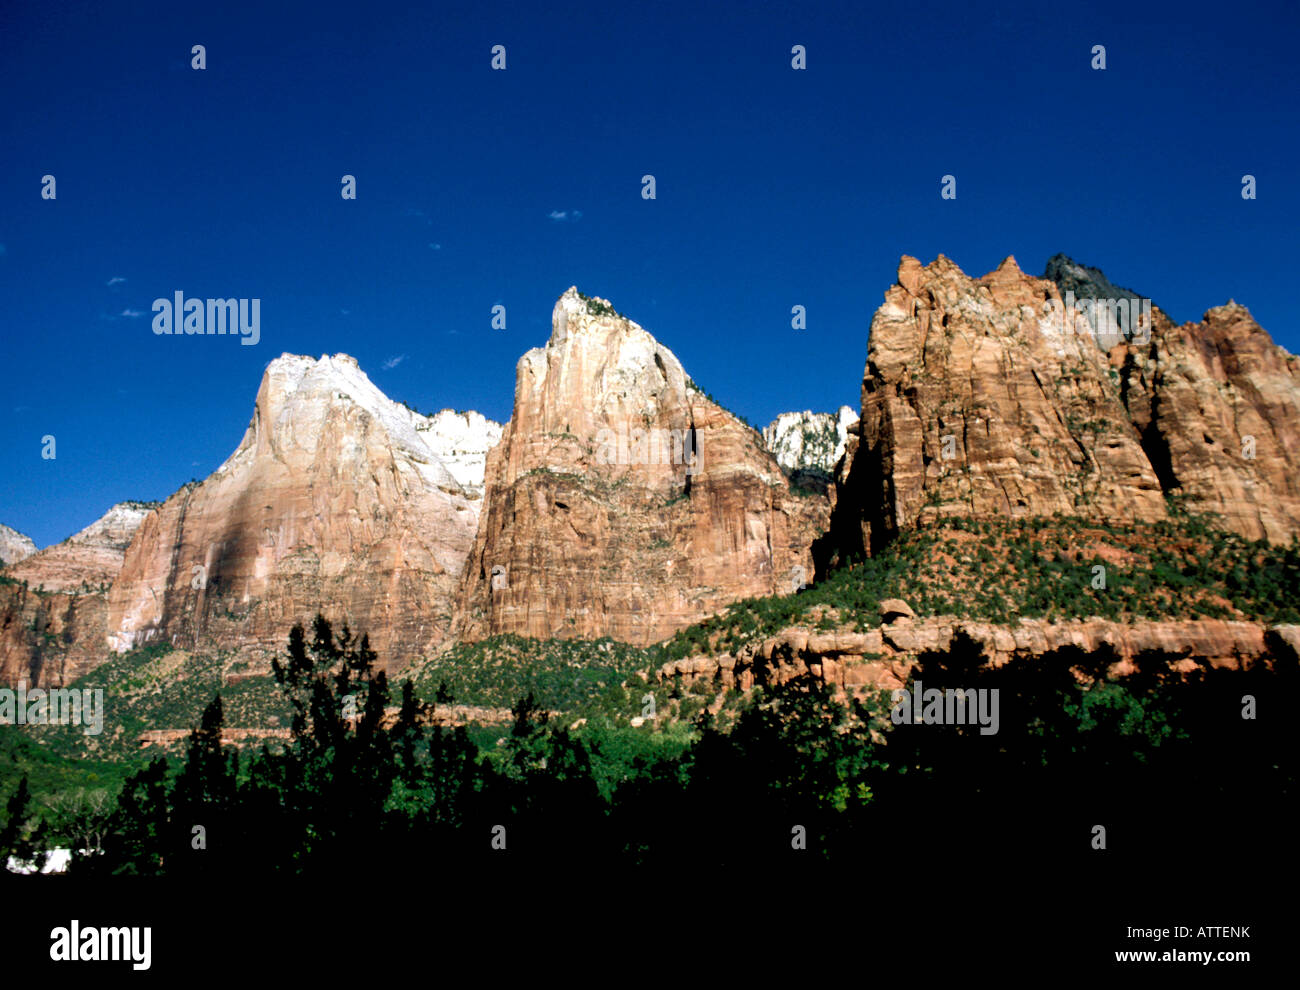 UT Utah Zion National Park geologic formations geology - Stock Image